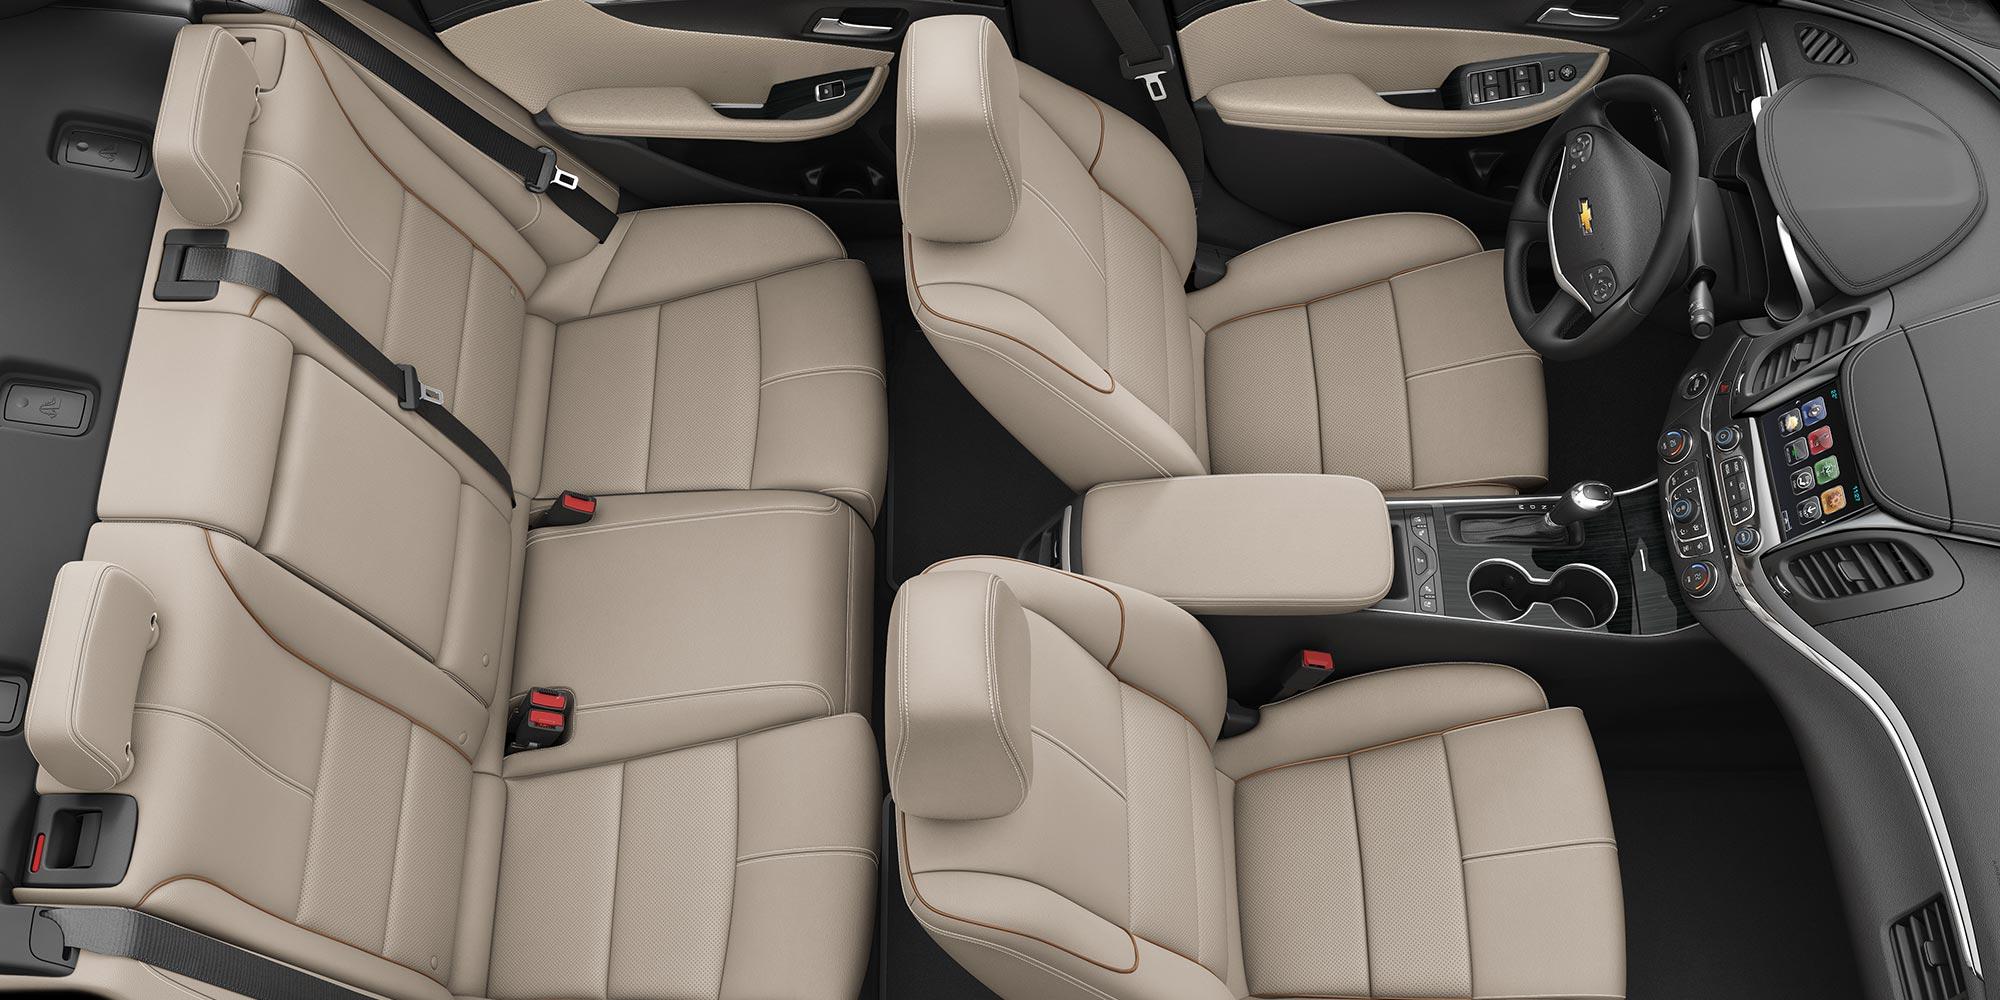 Delightful 2019 Impala Full Size Car Interior Photo: Seating Design Ideas